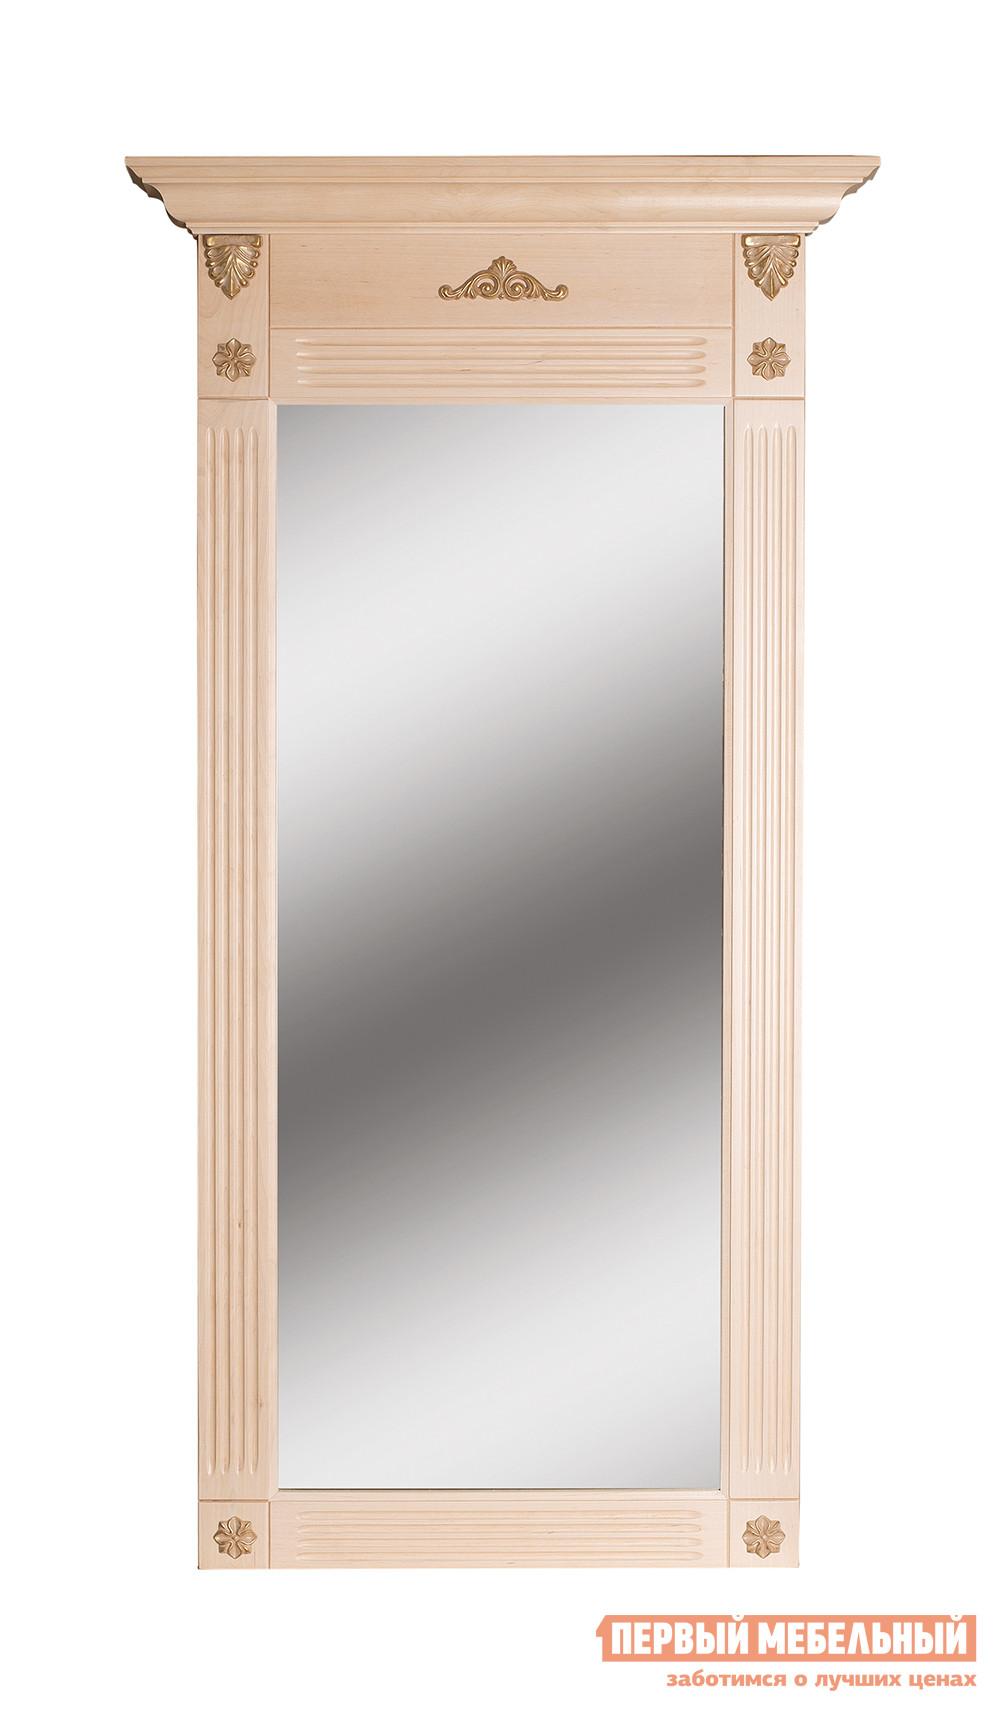 Настенное зеркало Мебелик Зеркало Сильвия